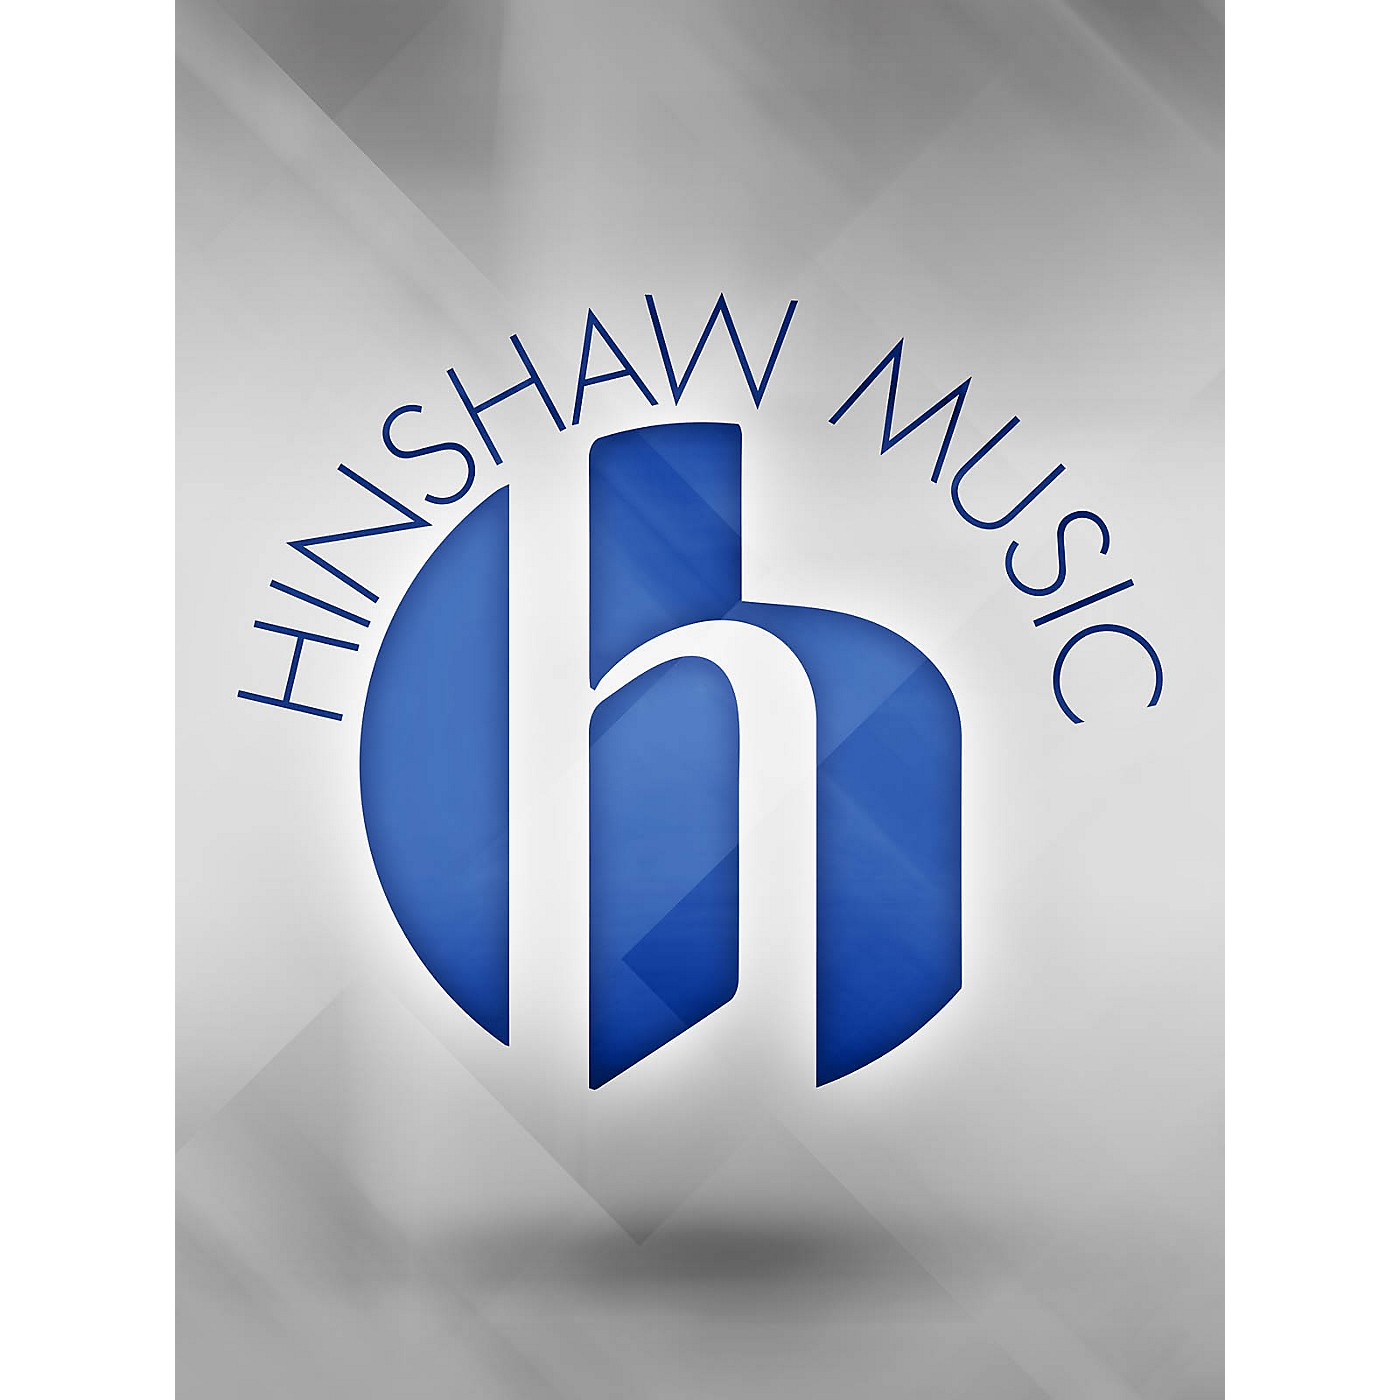 Hal Leonard Always Be My Home - Instr. thumbnail